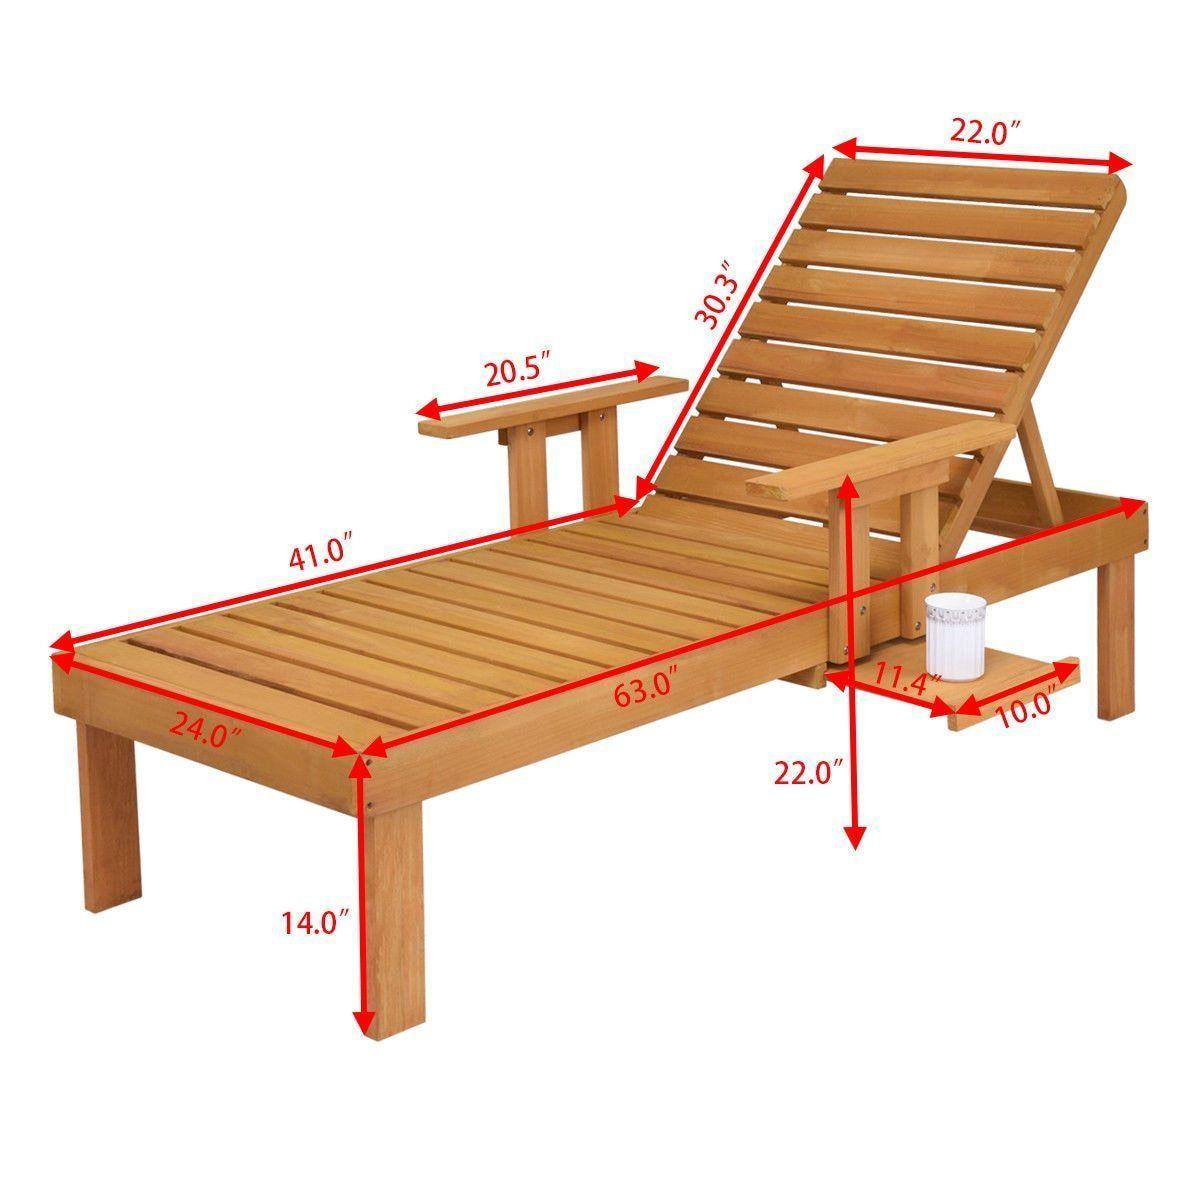 Patio lounger chaise sun outdoor furniture garden side tray